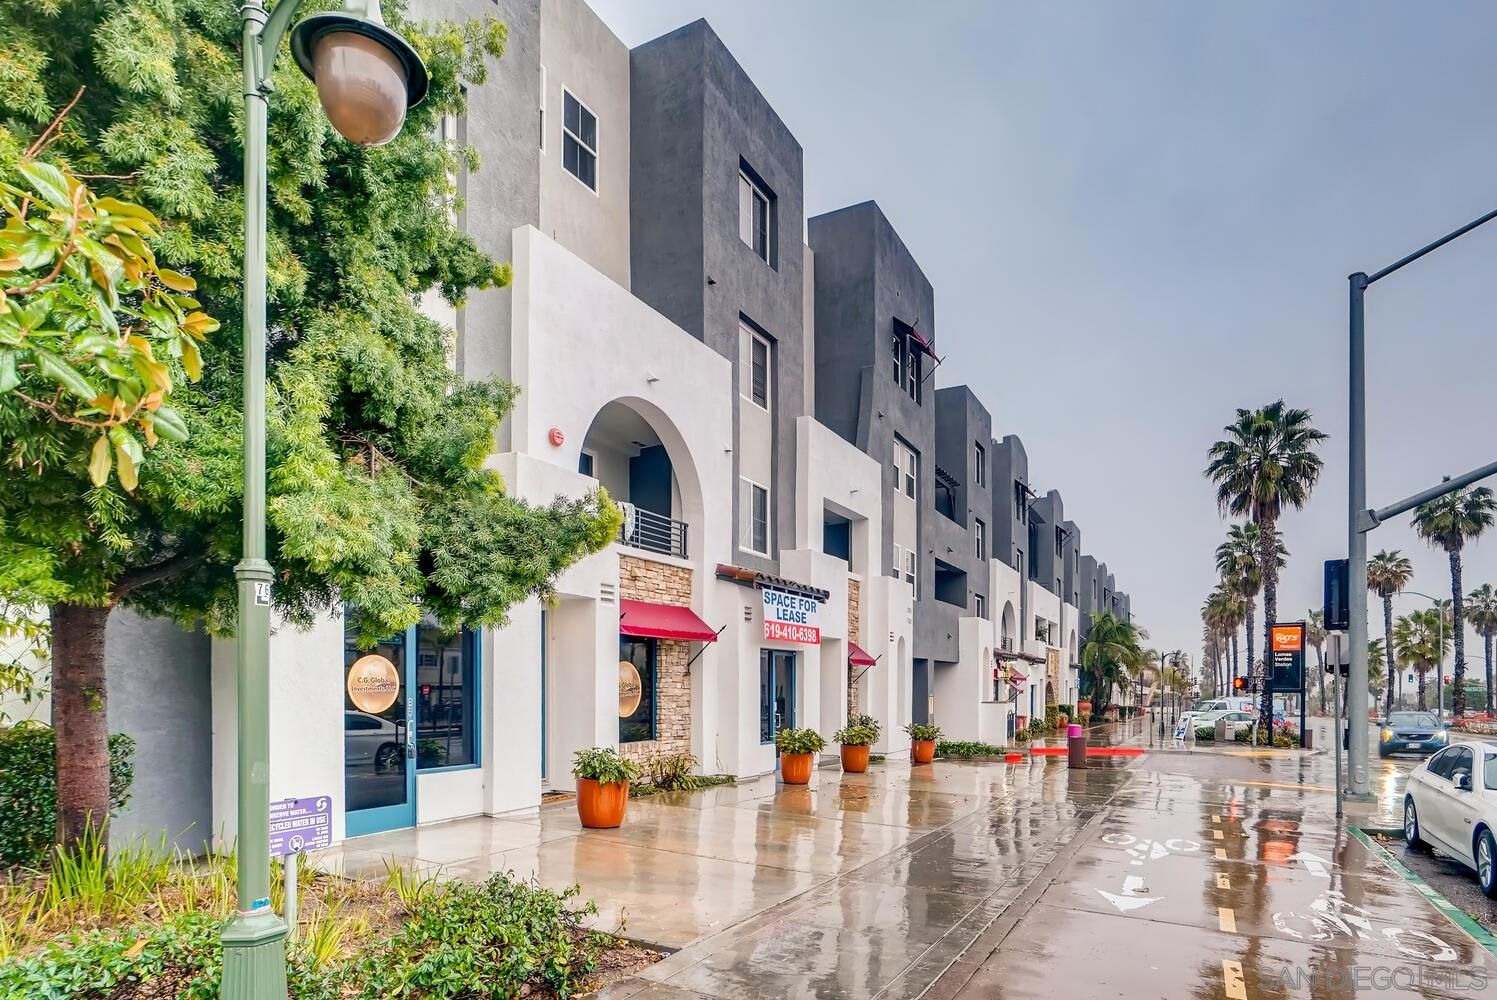 Main Photo: CHULA VISTA Townhouse for sale : 2 bedrooms : 1760 E Palomar #121